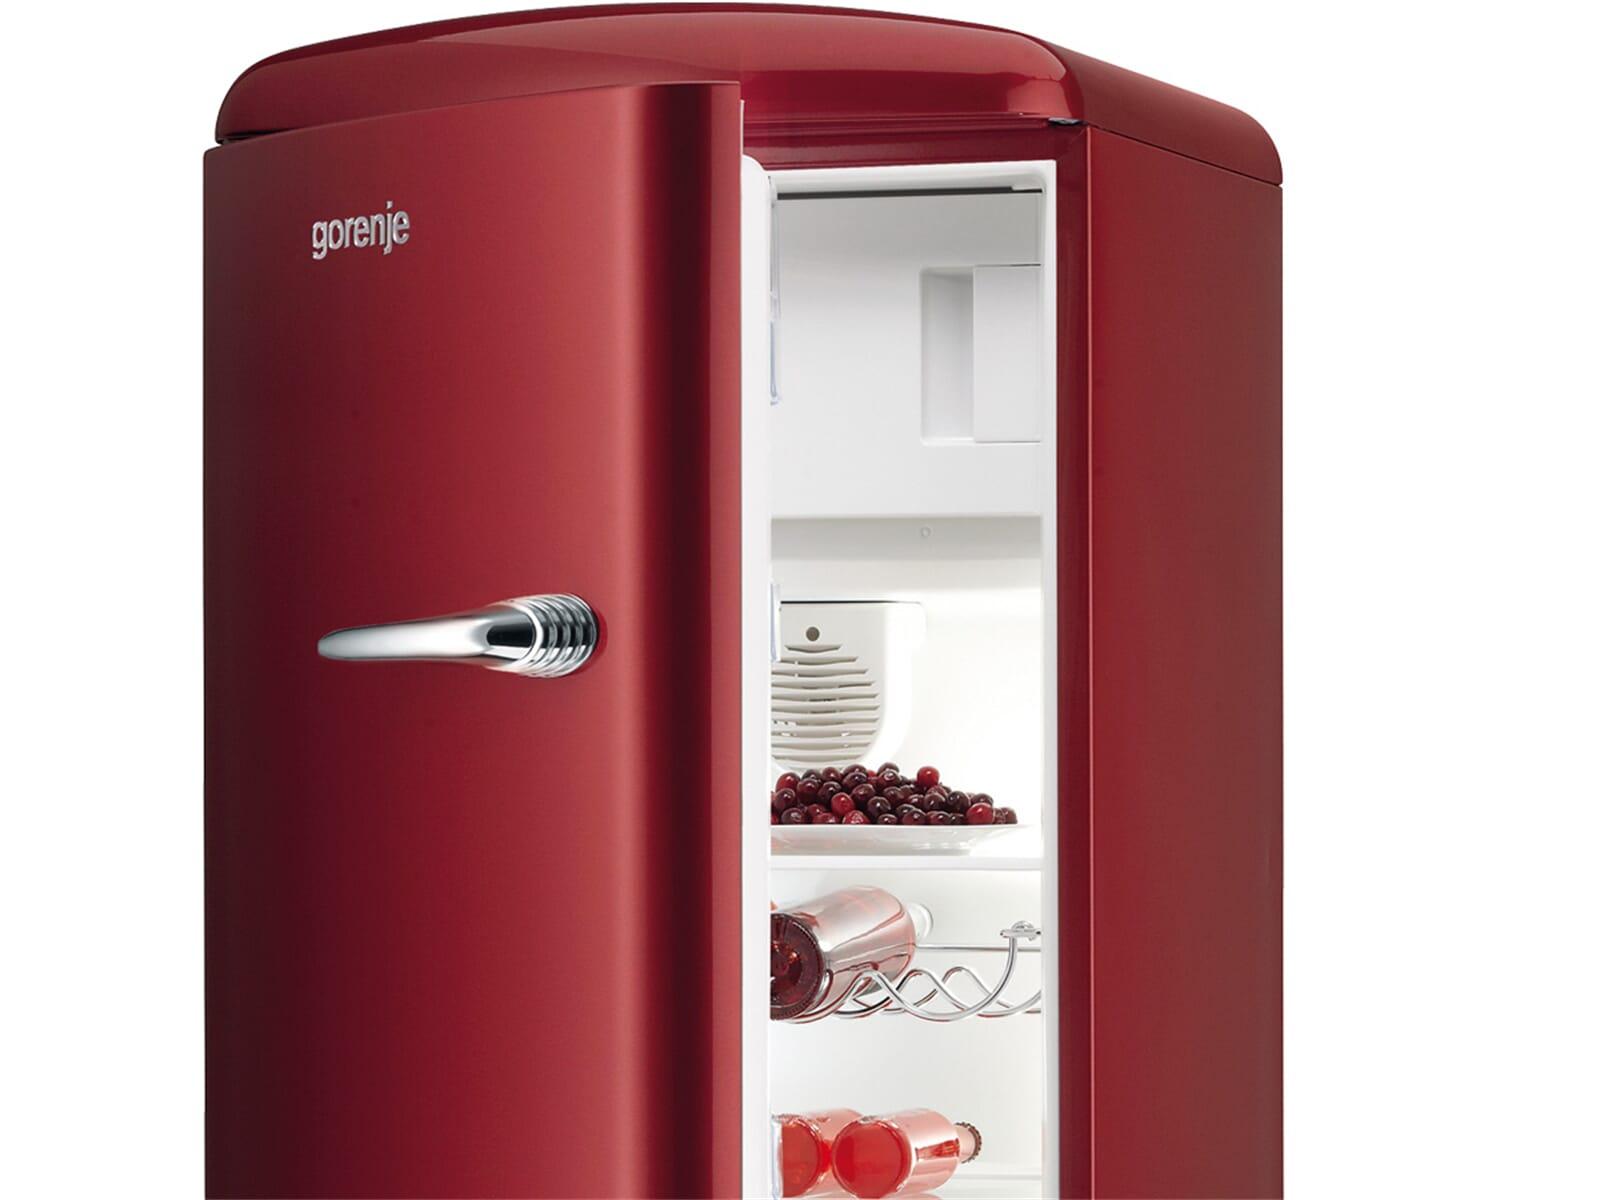 Gorenje Kühlschrank Retro Bedienungsanleitung : Kühlschrank rb60299or kendra e. sikes